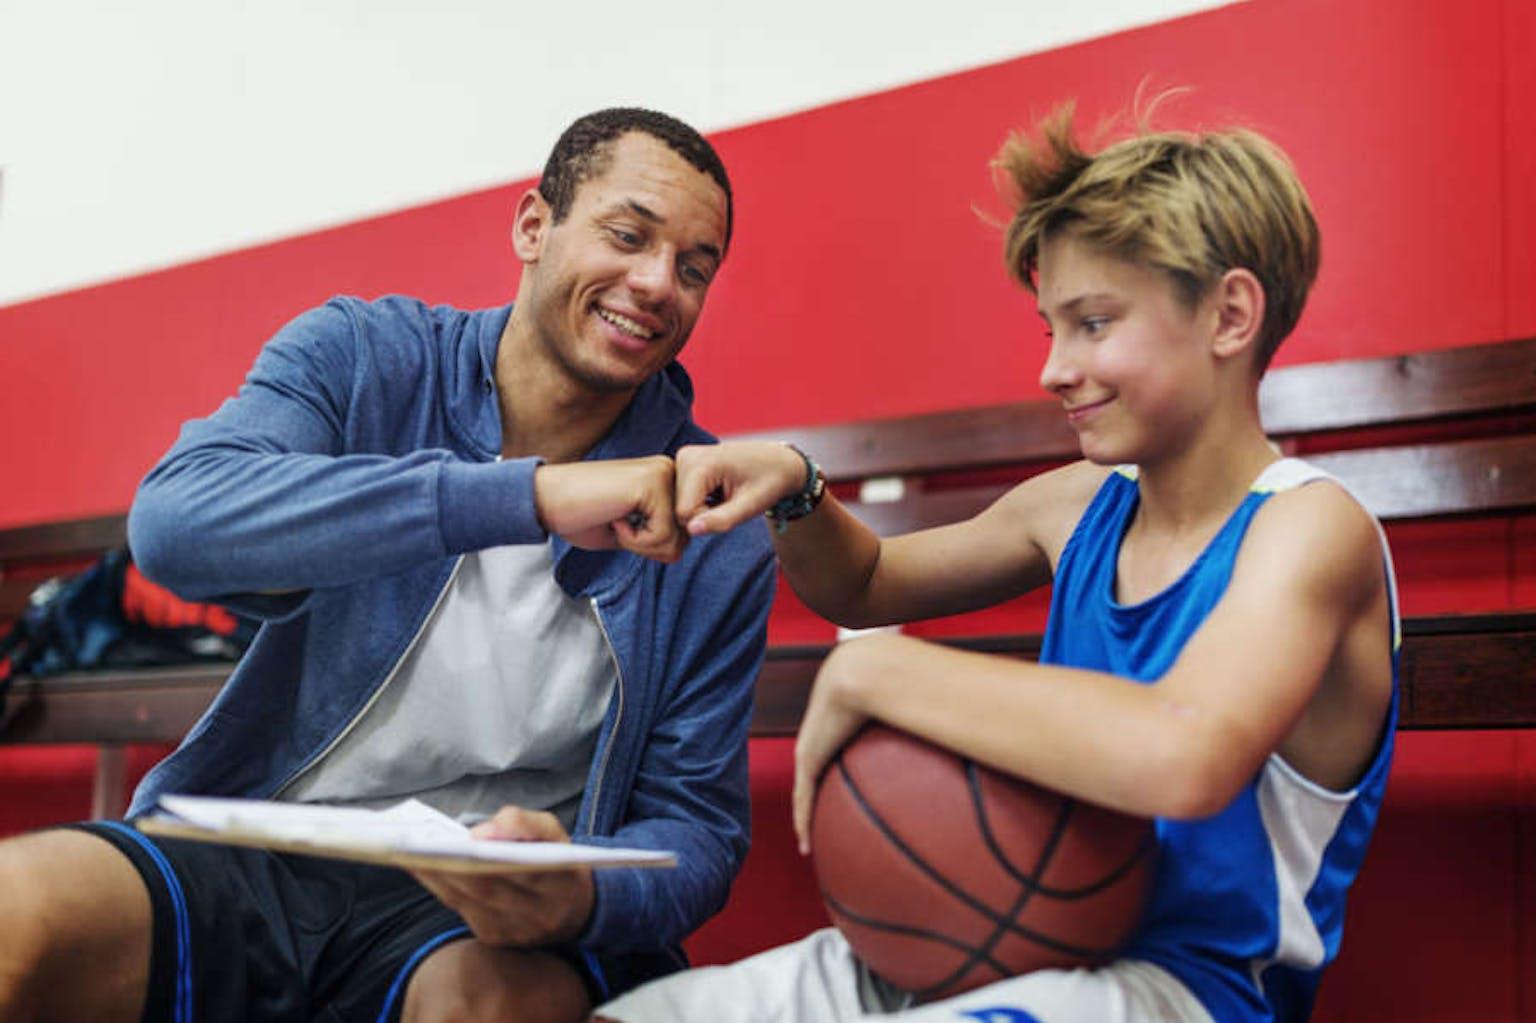 Basketball coach and boy fist bumping